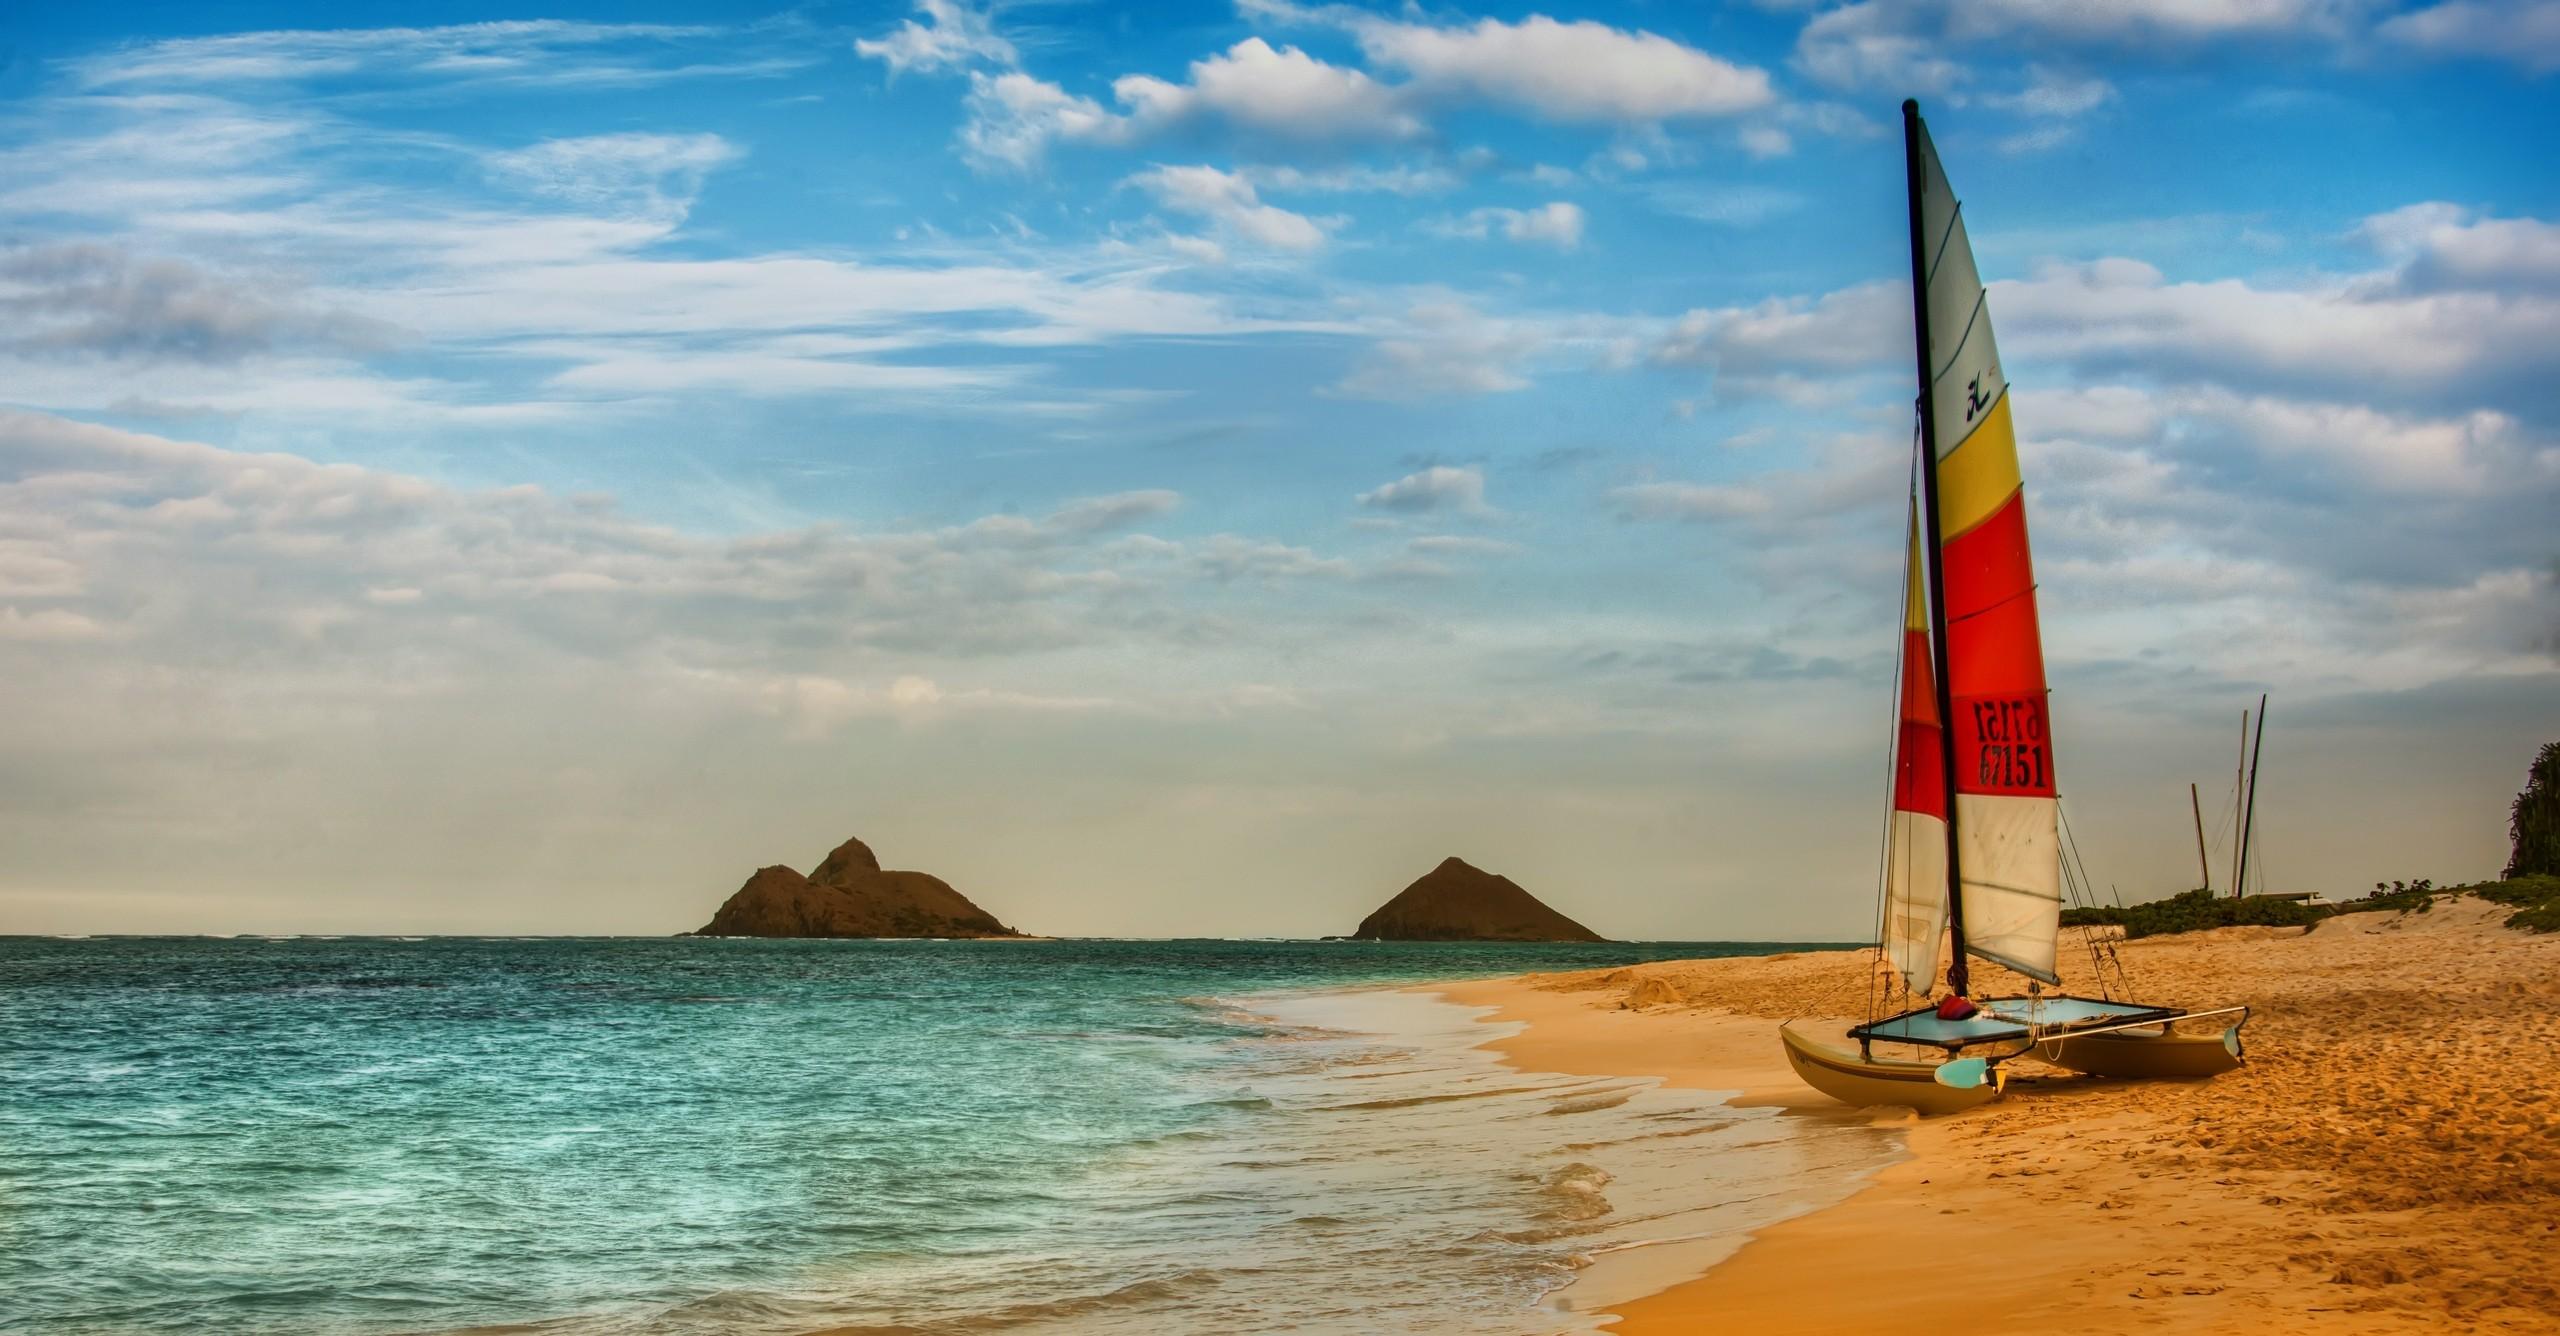 Beaches colorful sailing sea. Boating clipart beach